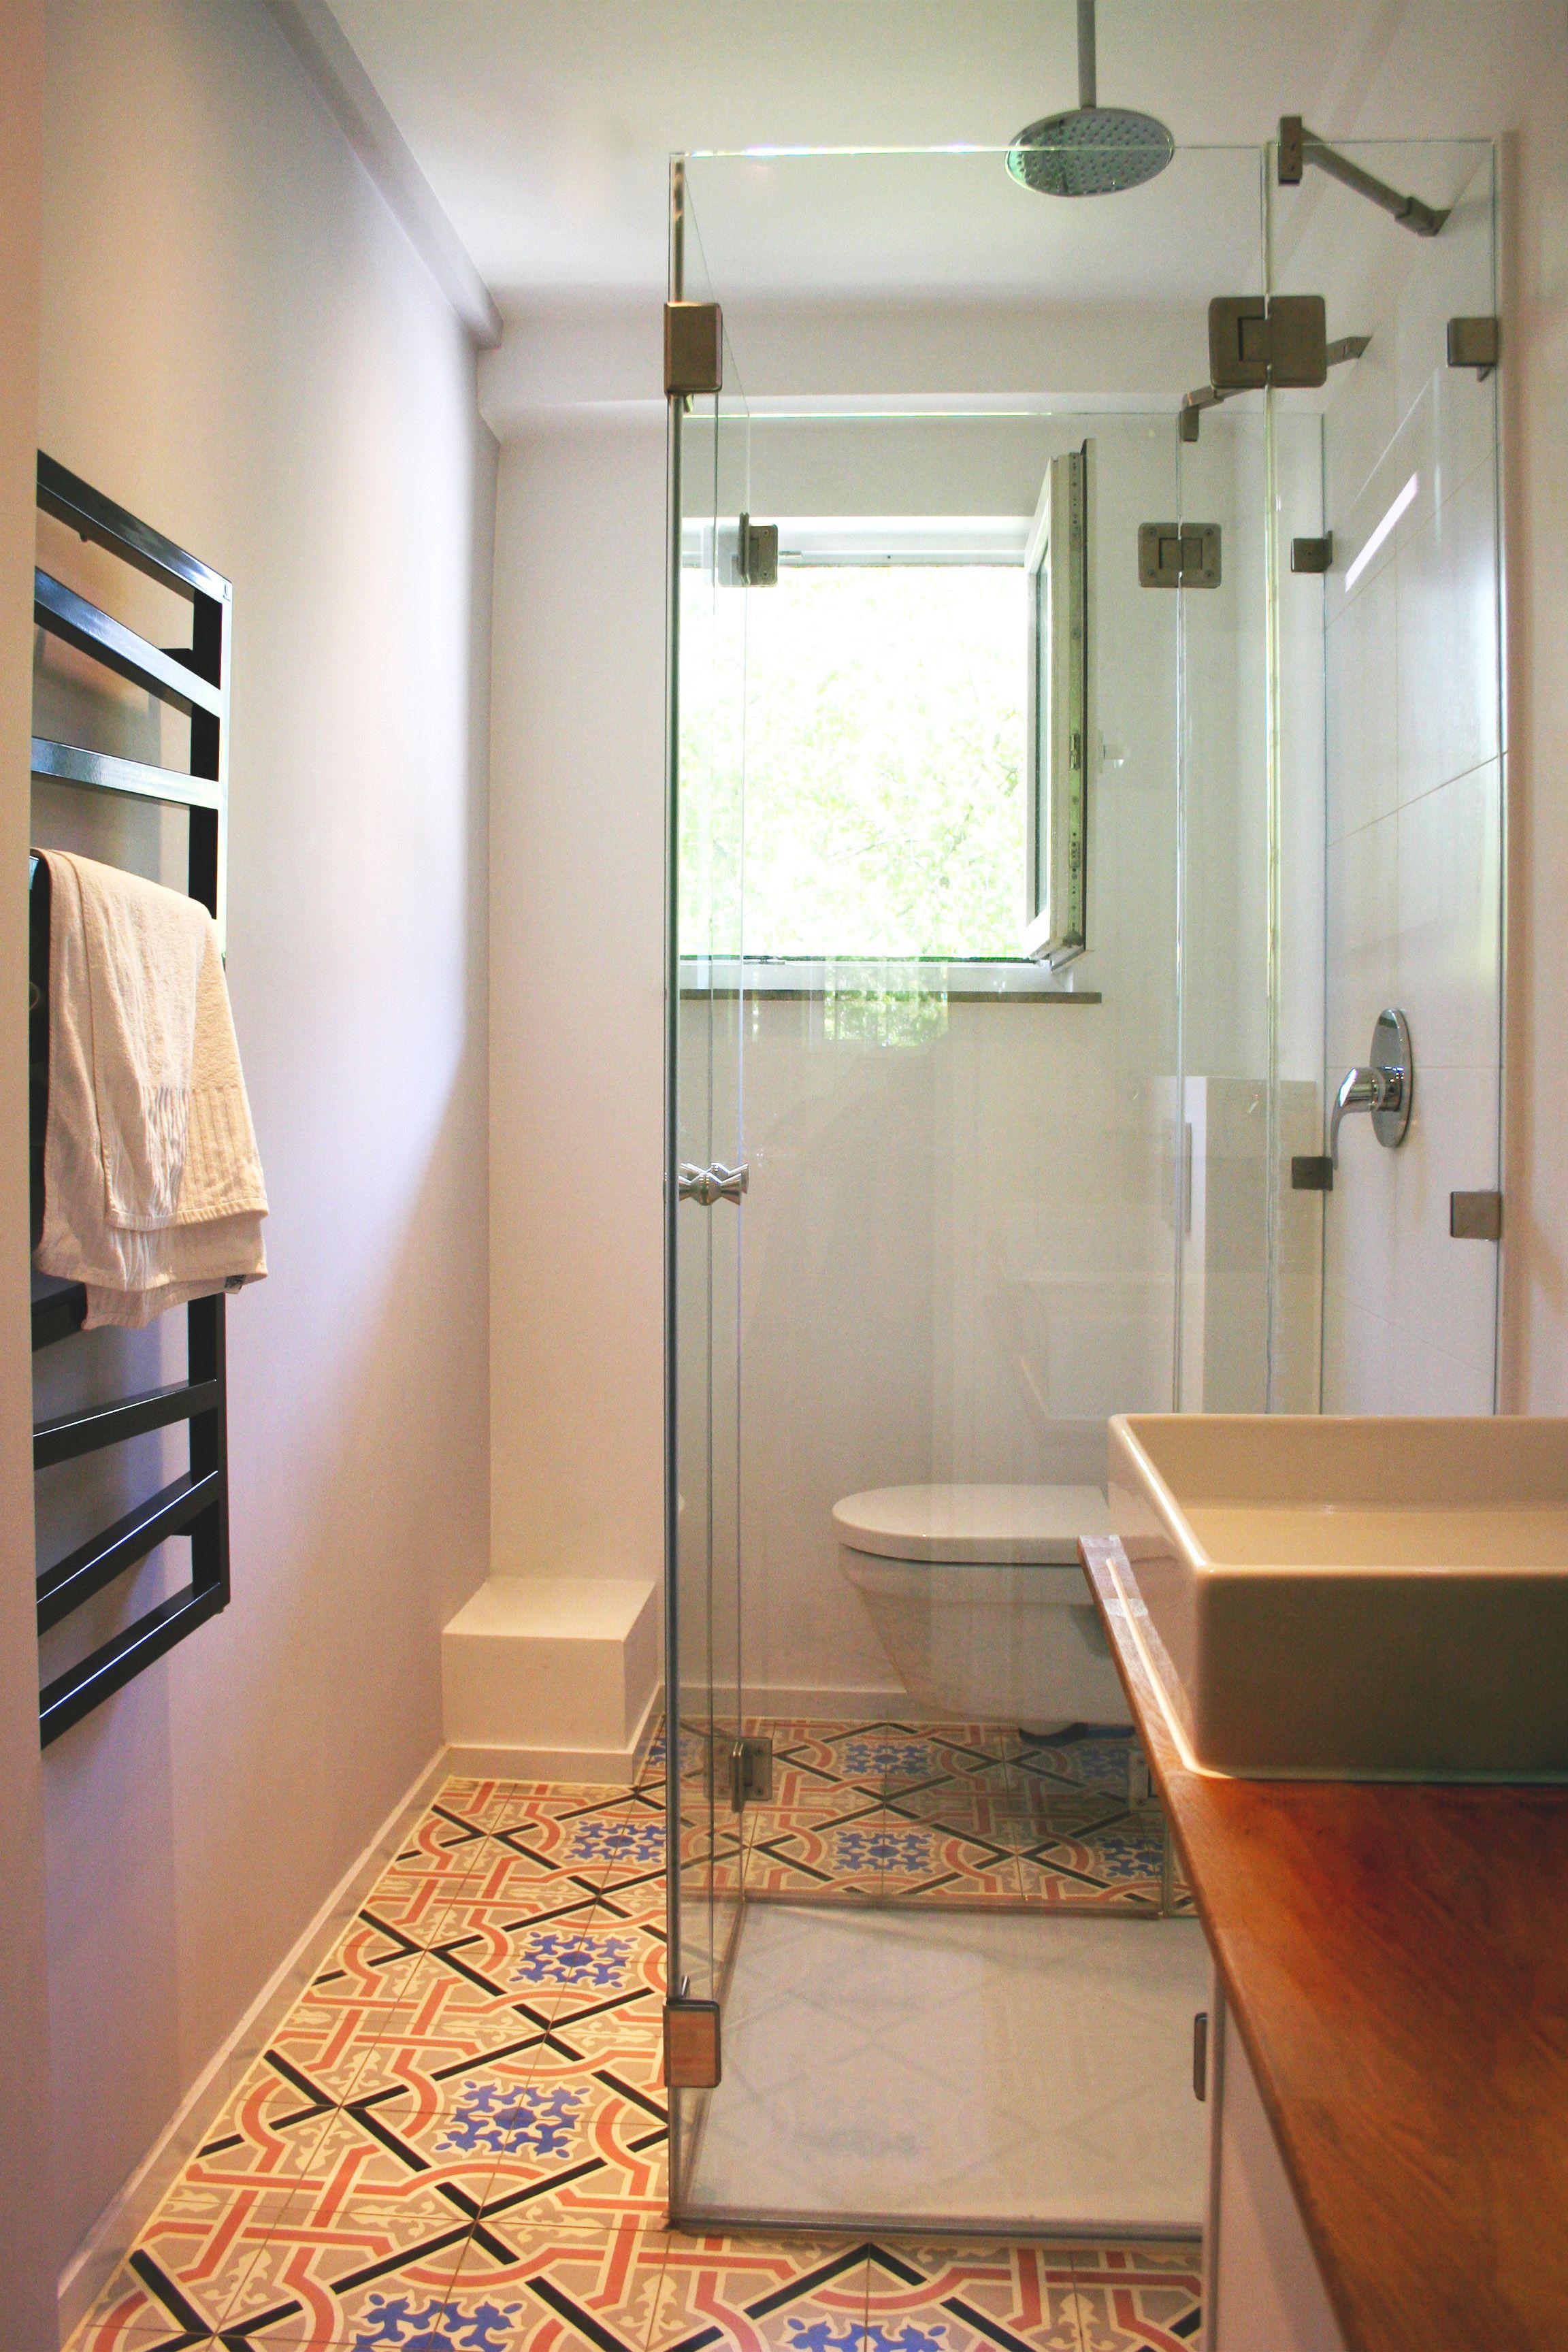 u duschkabine breuer duschkabine espira ukabine mit drehtr with u duschkabine simple blies. Black Bedroom Furniture Sets. Home Design Ideas